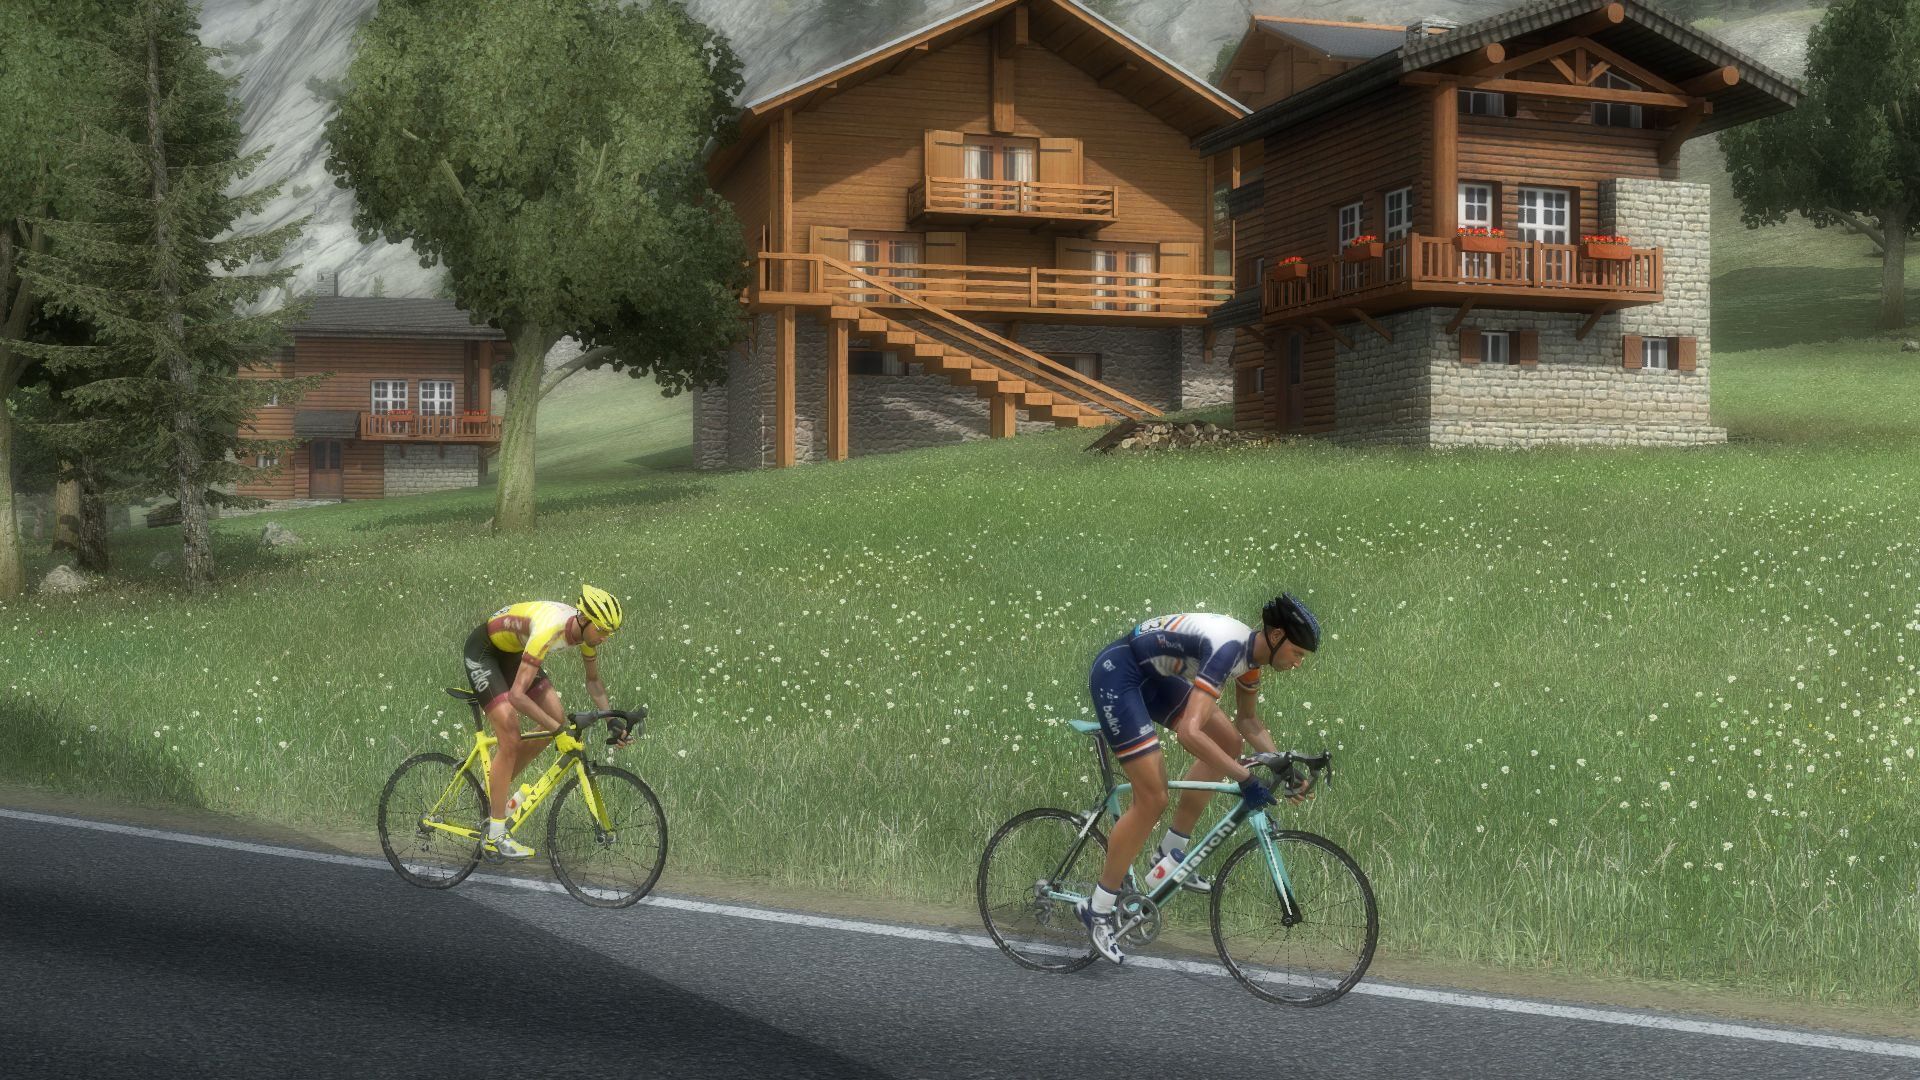 pcmdaily.com/images/mg/2020/Reports/GTM/Giro/S20/mg20_giro_s20_012.jpg